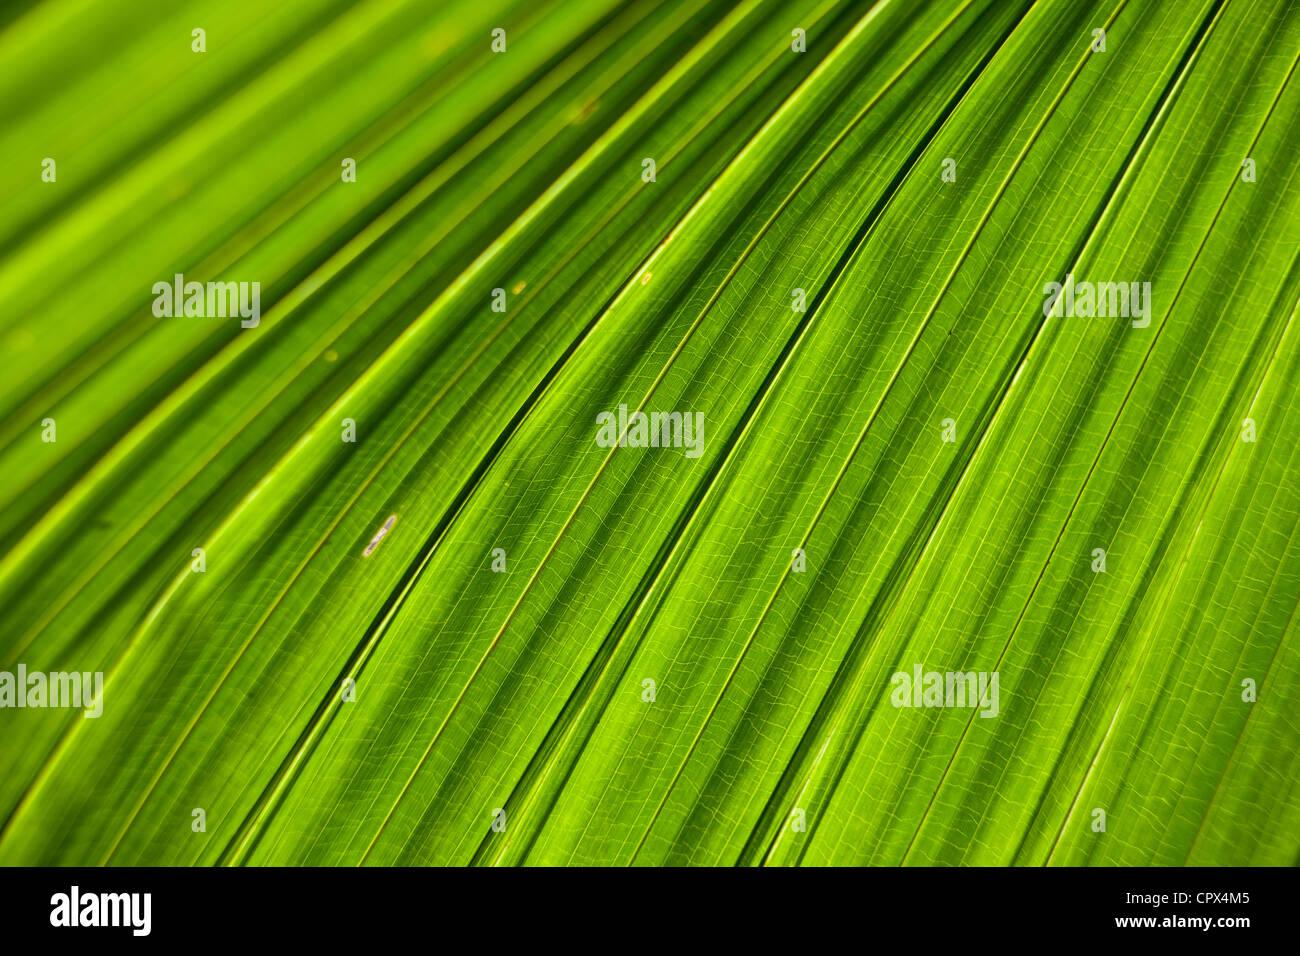 Detalle de hojas, Siquijor, Visayas, Filipinas Imagen De Stock